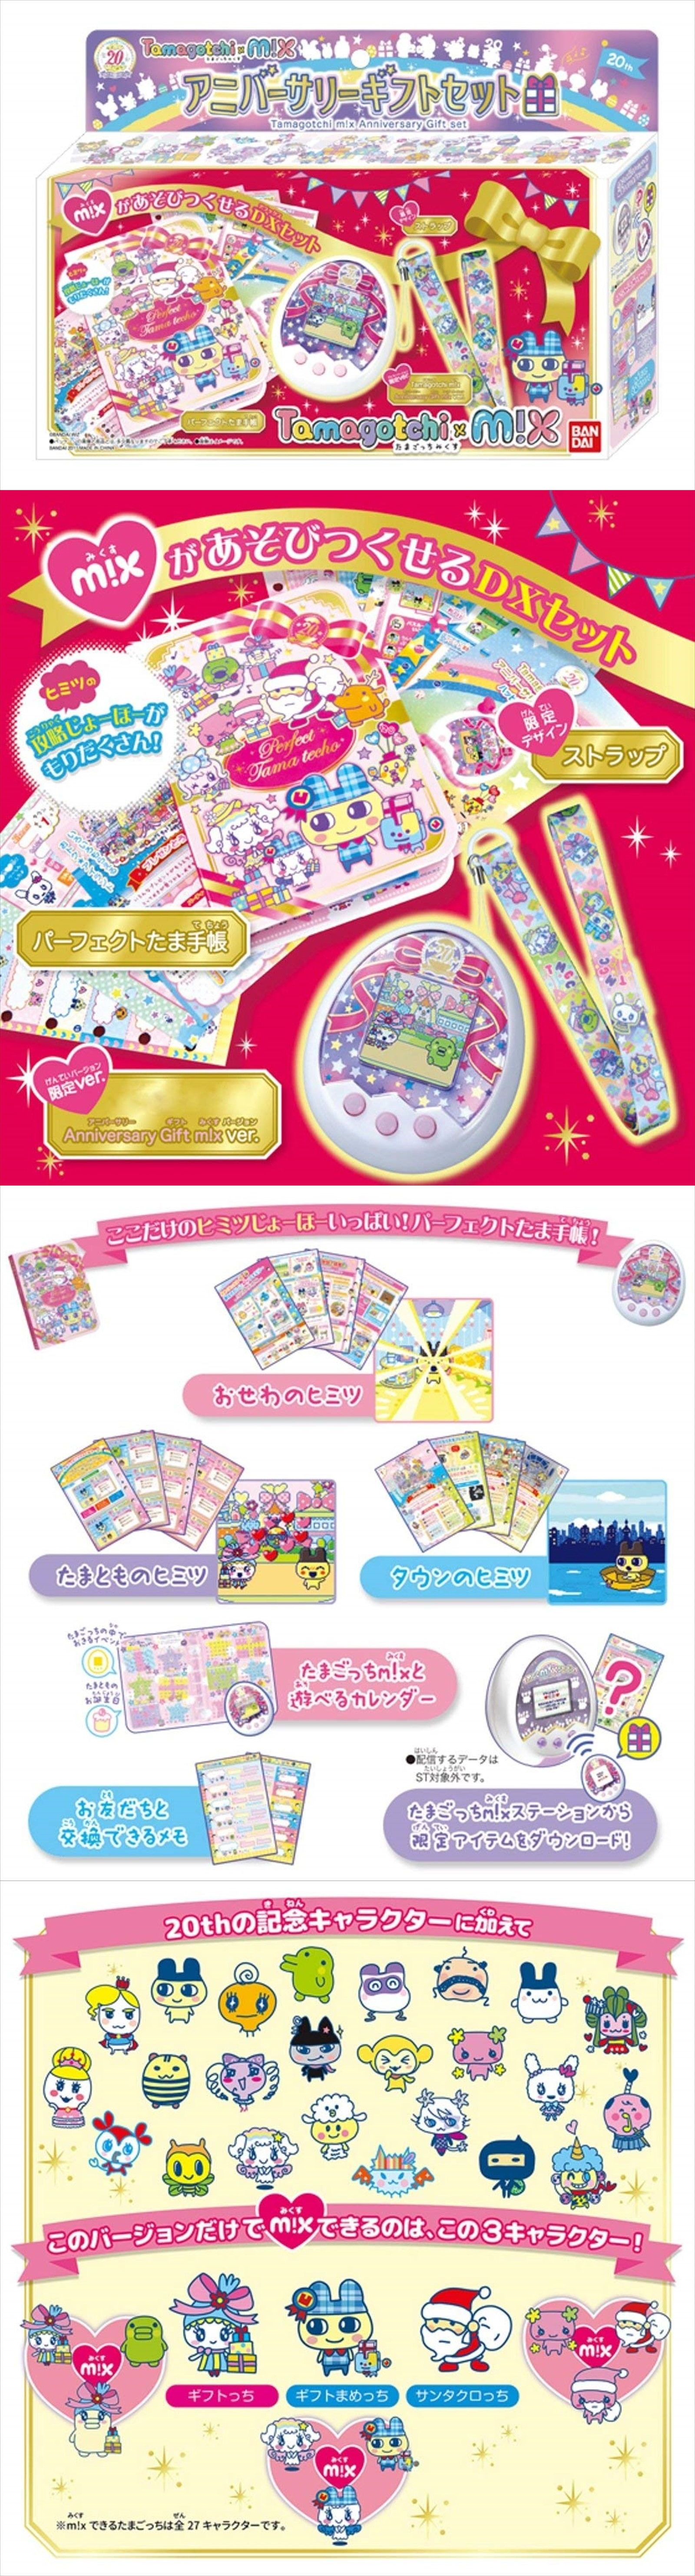 Tamagotchi 1084: Tamagotchi Mix Anniversary Gift Set Bandai Limited